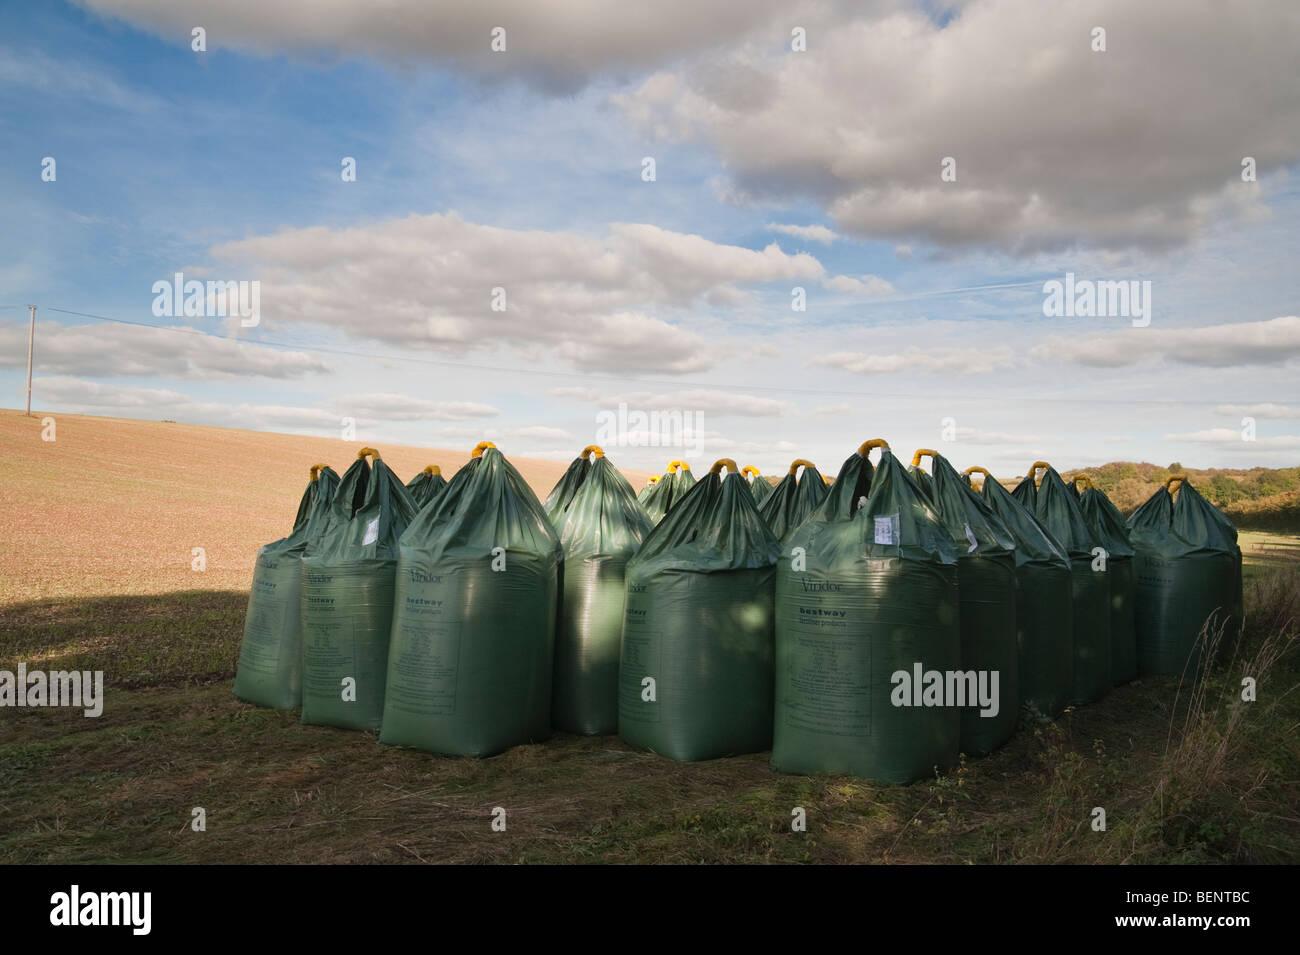 Large chemical fertiliser bags beside a field - Stock Image